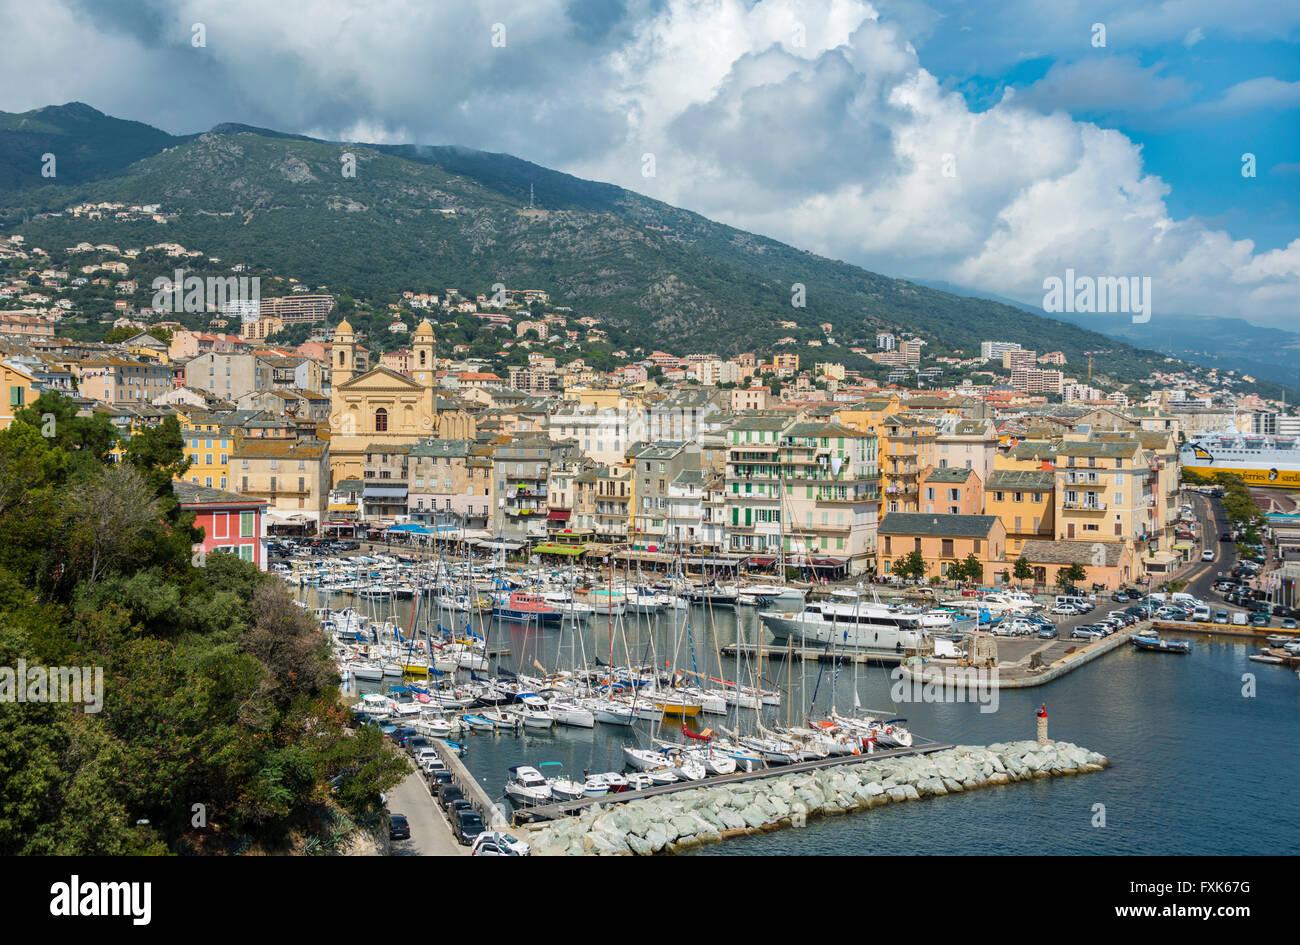 Old port, Vieux port, Port de Plaisance, marina with the church Saint Jean Baptiste, Bastia, Haute-Corse, North - Stock Image